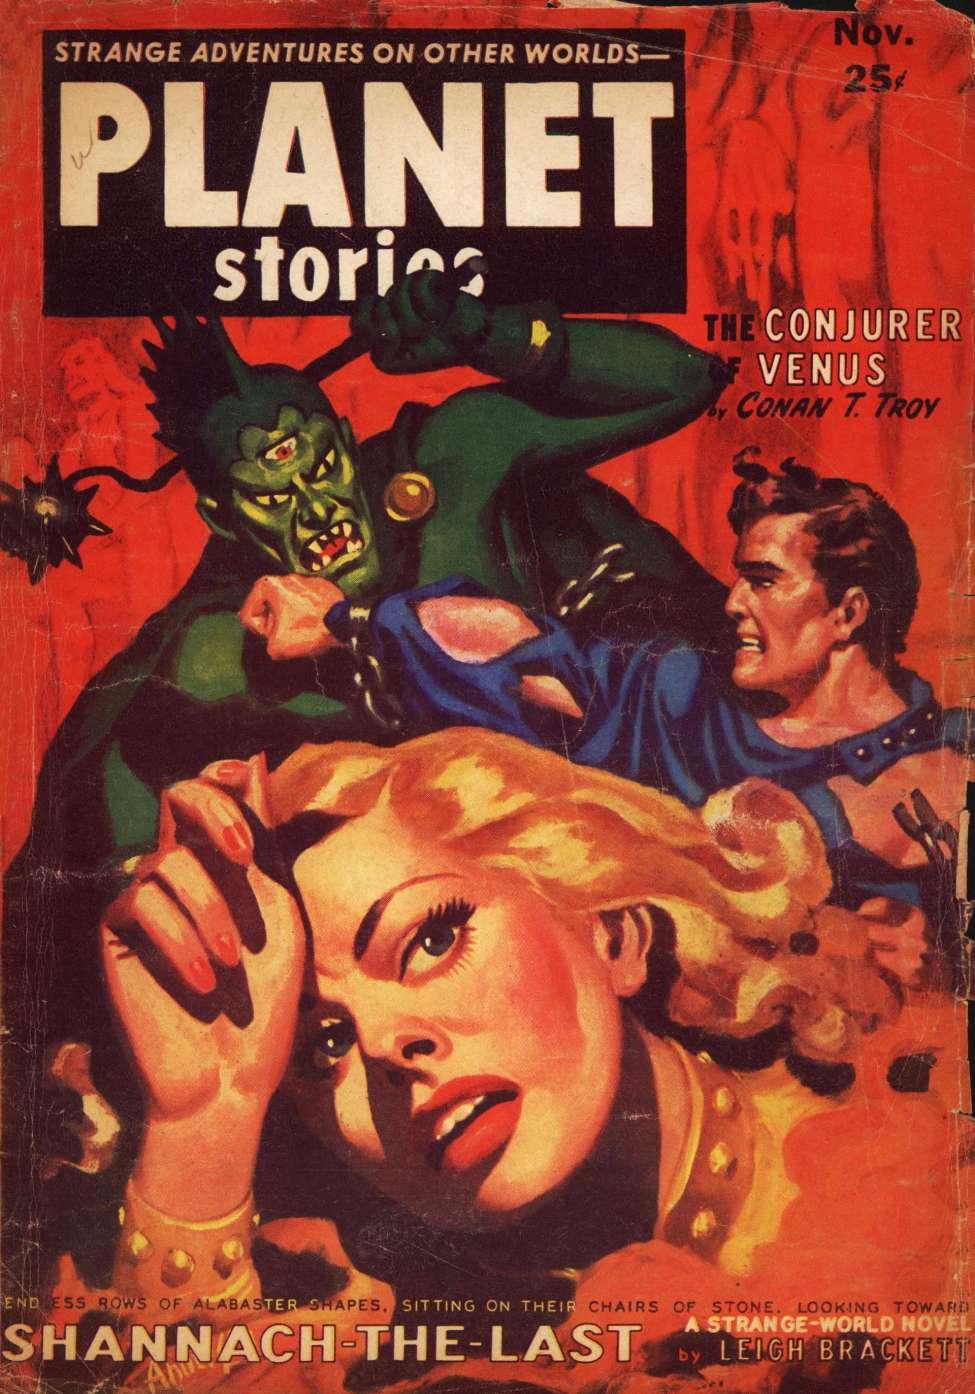 Comic Book Cover For Planet Stories v05 09 - Shannach - The Last - Leigh Brackett